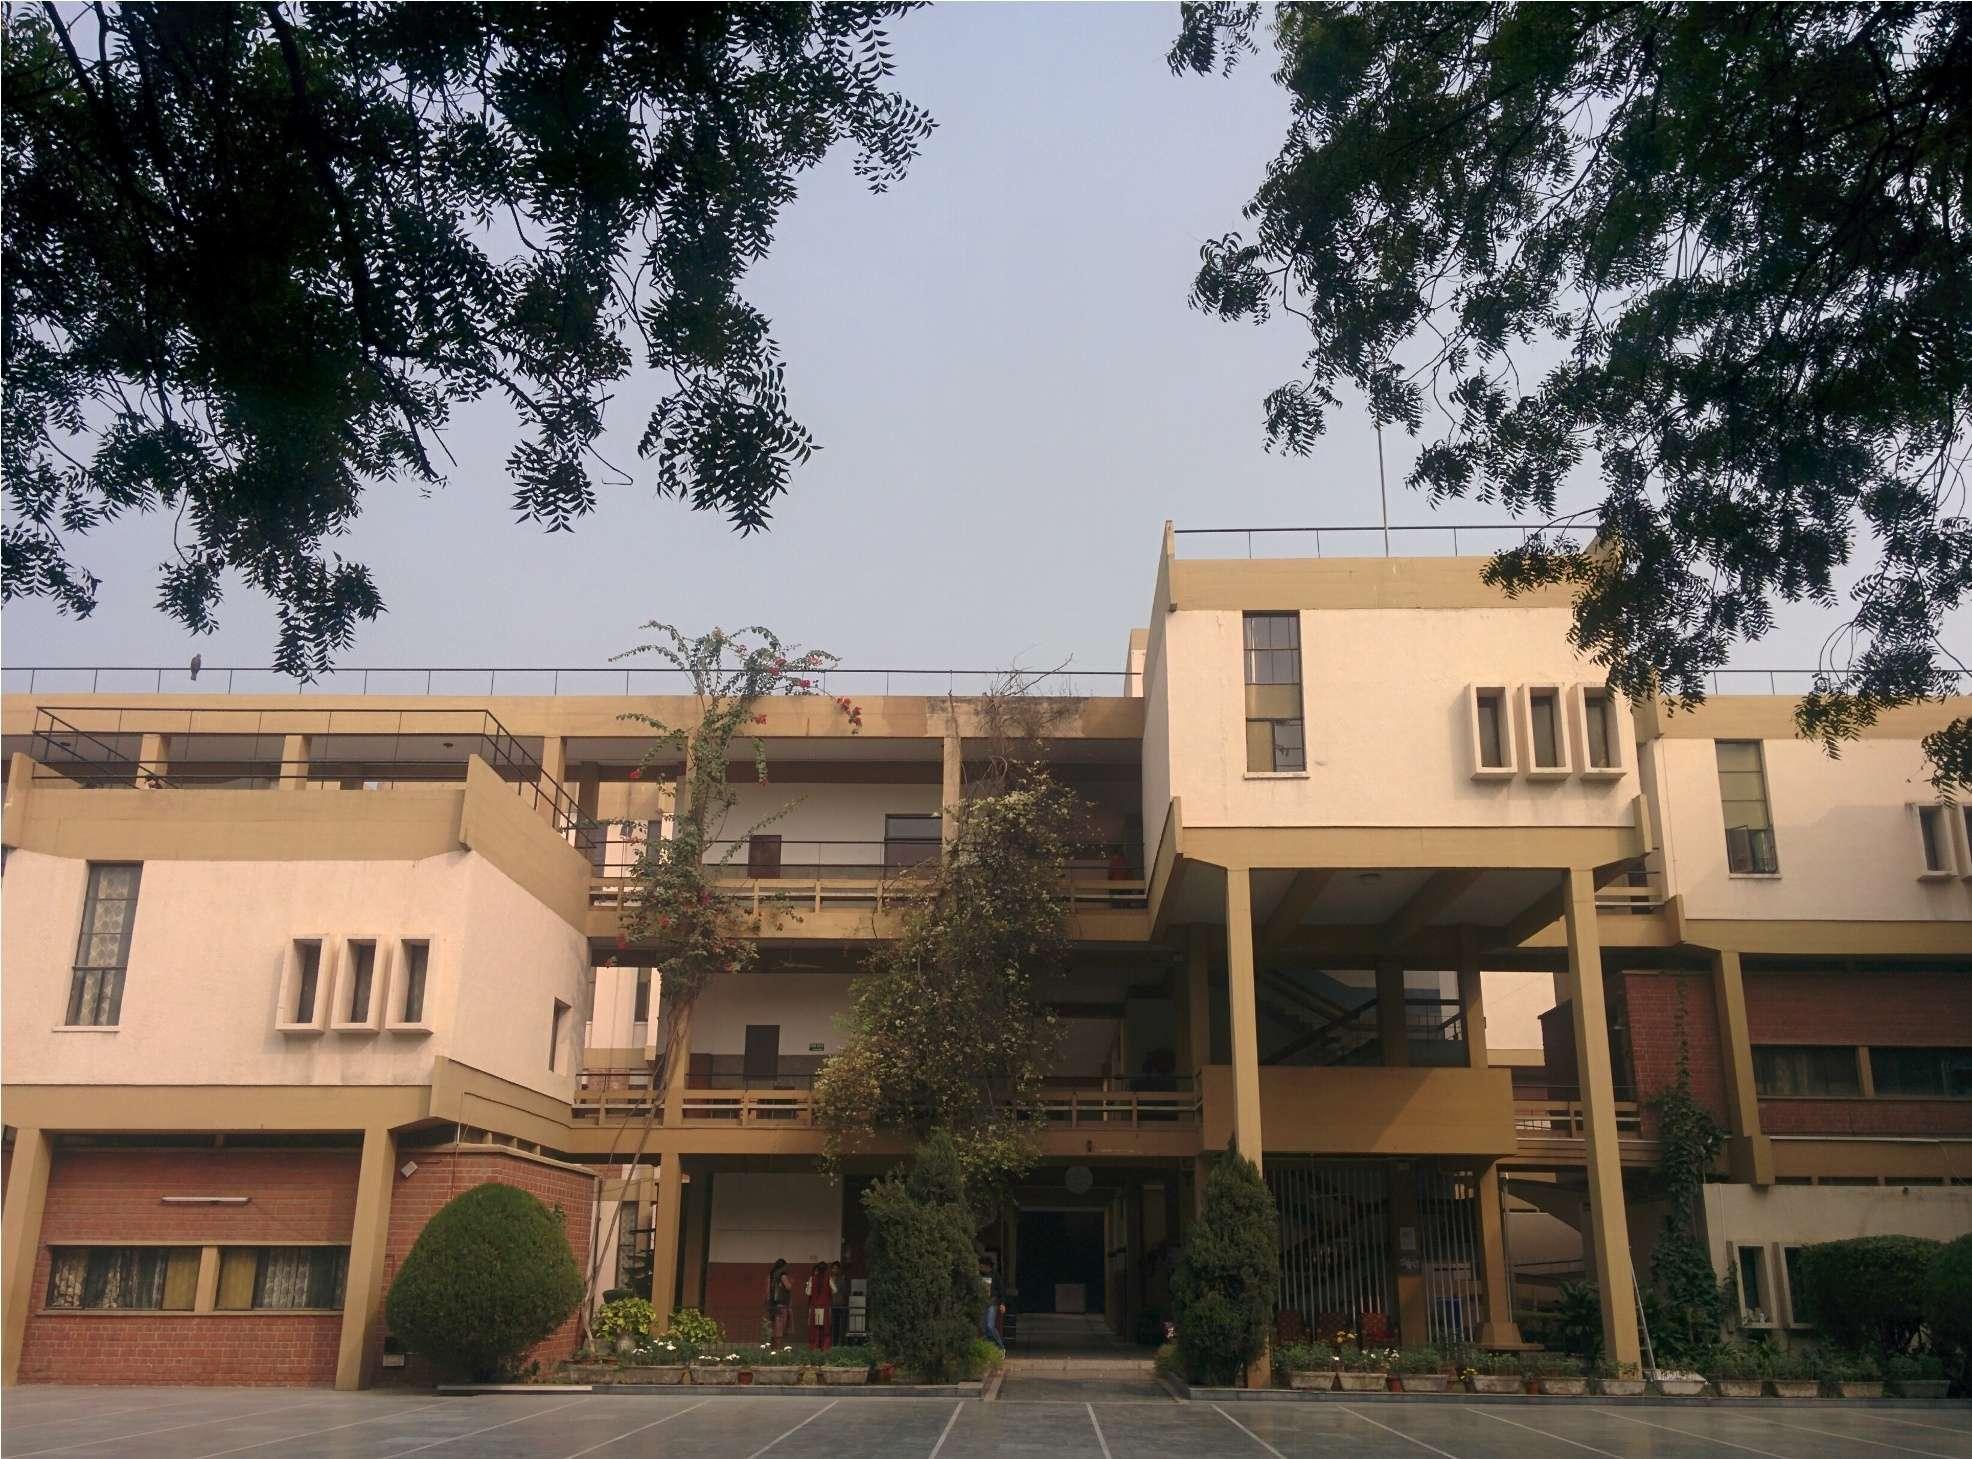 CARMEL CONVENT SCHOOL DIPLOMATIC ENCLAVE CHANAKYAPURI NEW DELHI 2730028